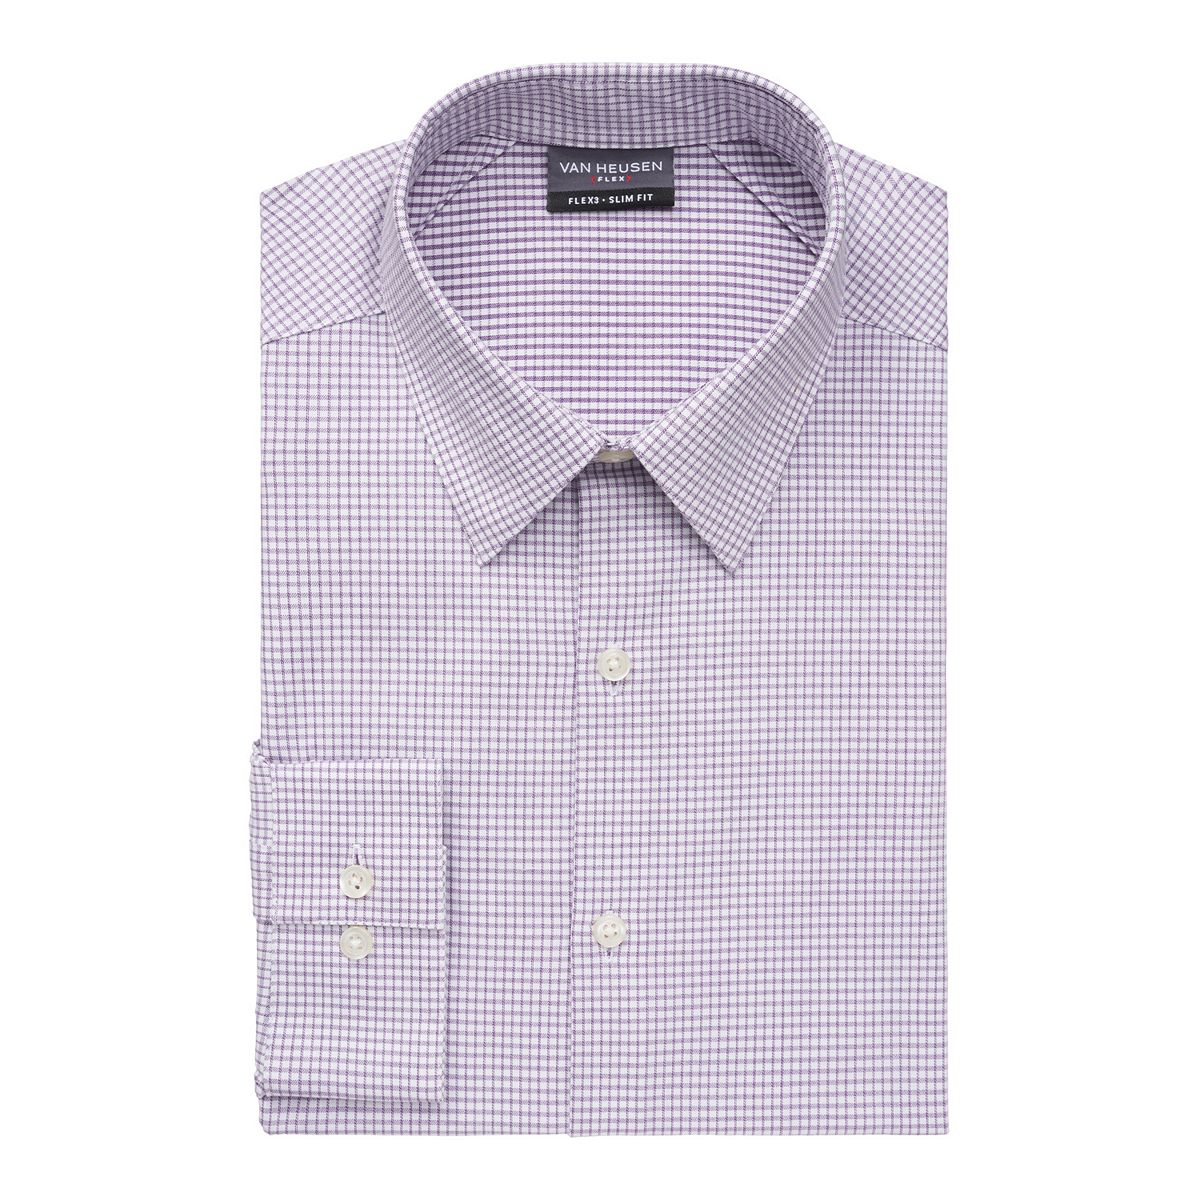 .30 Men's Van Heusen Slim-Fit 4-Way Stretch Flex 3 Point-Collar Dress Shirt at Kohl's!